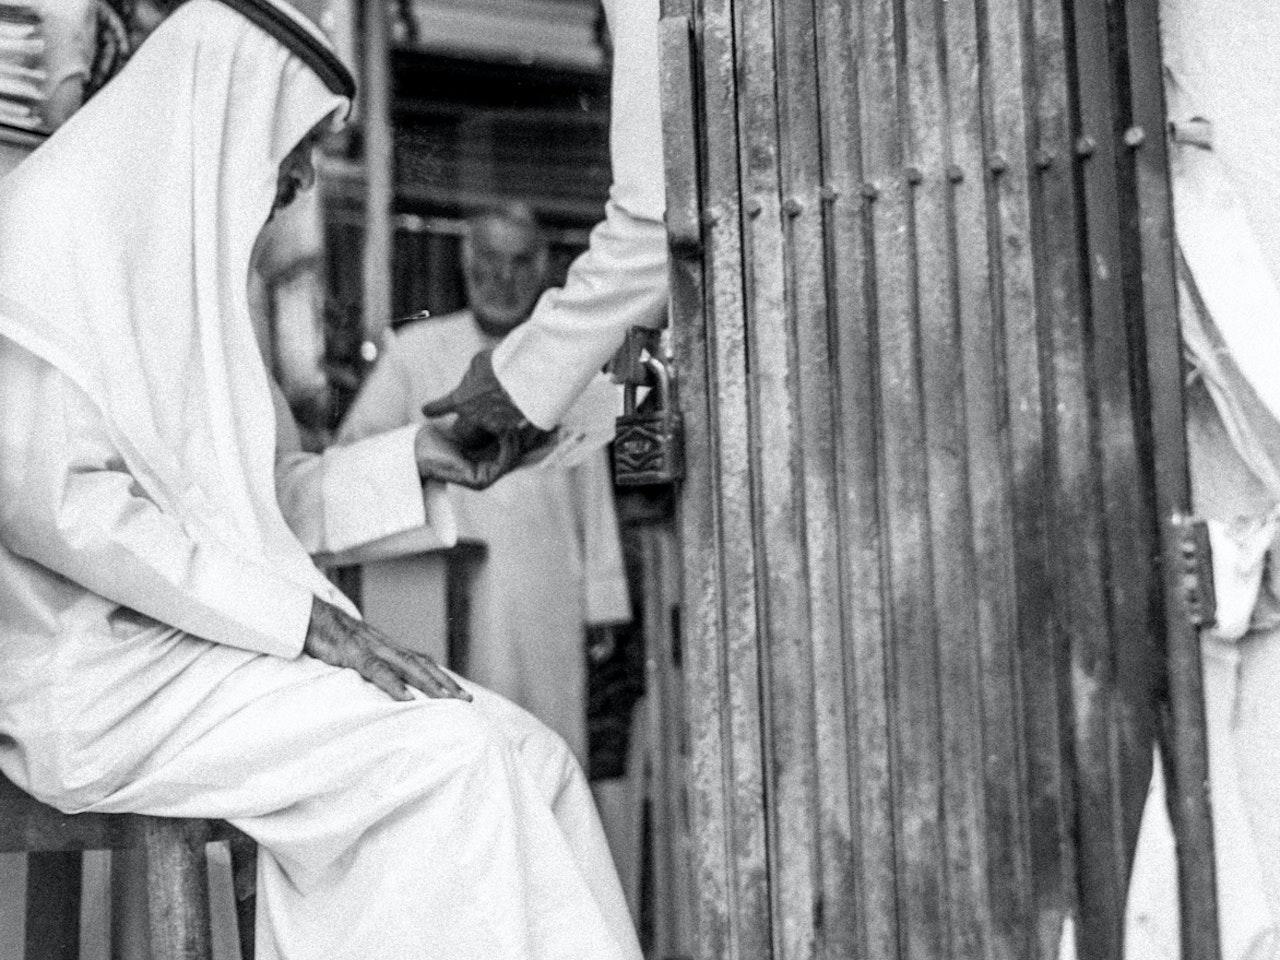 Sheikh-Buying-Shit-small